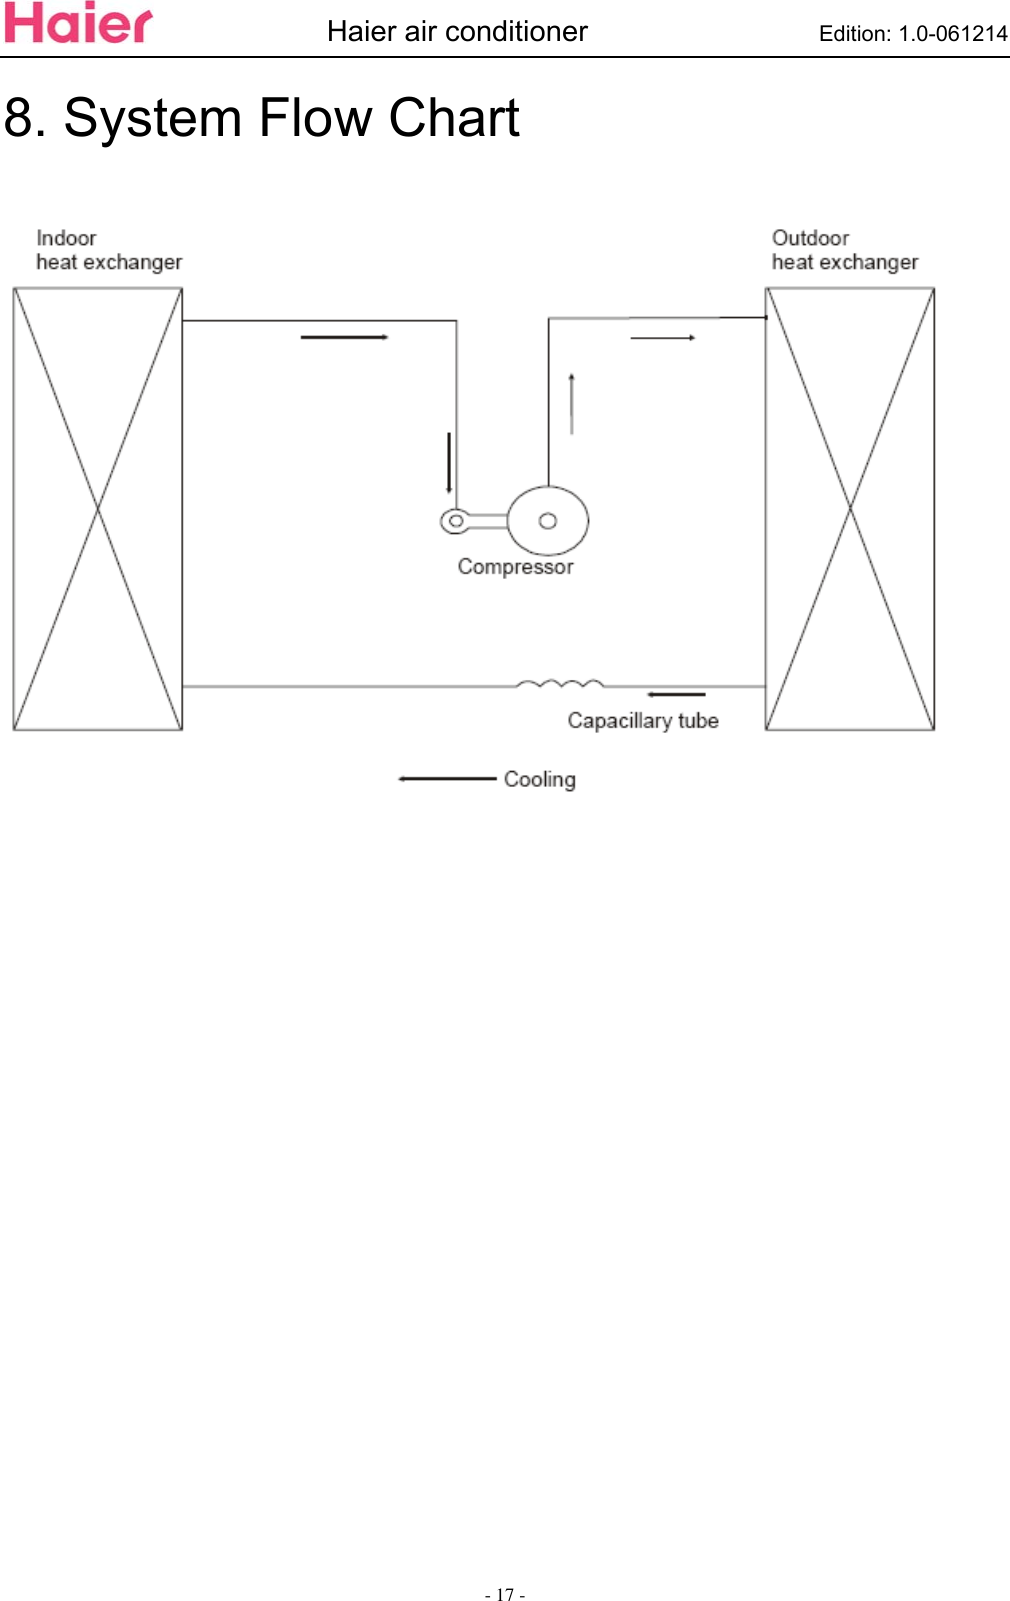 Haier Air Conditioner Esa3087 Users Manual ESA3067 SM_06 11 30_ on rheem manuals wiring diagrams, evcon heat pump wiring diagrams, haier heat pump parts, amana heat pump wiring diagrams,